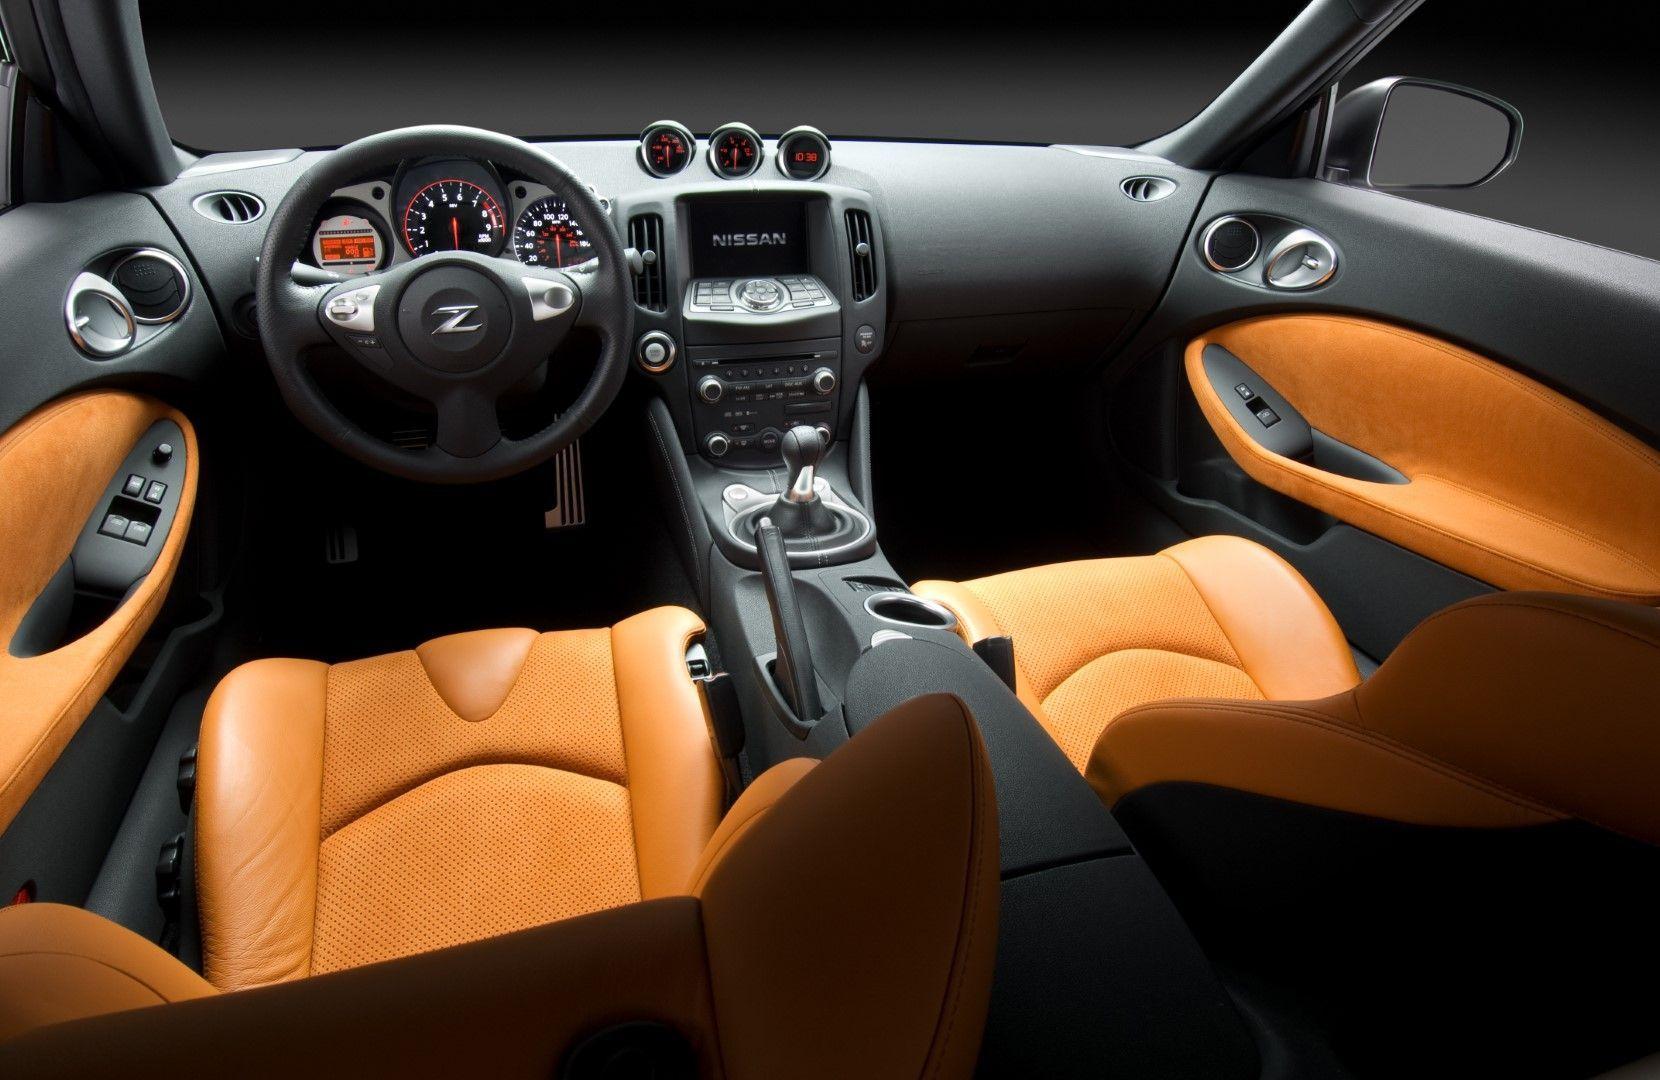 2010 Nissan 370Z Nissan 370z, Nissan z, Nissan 370z nismo